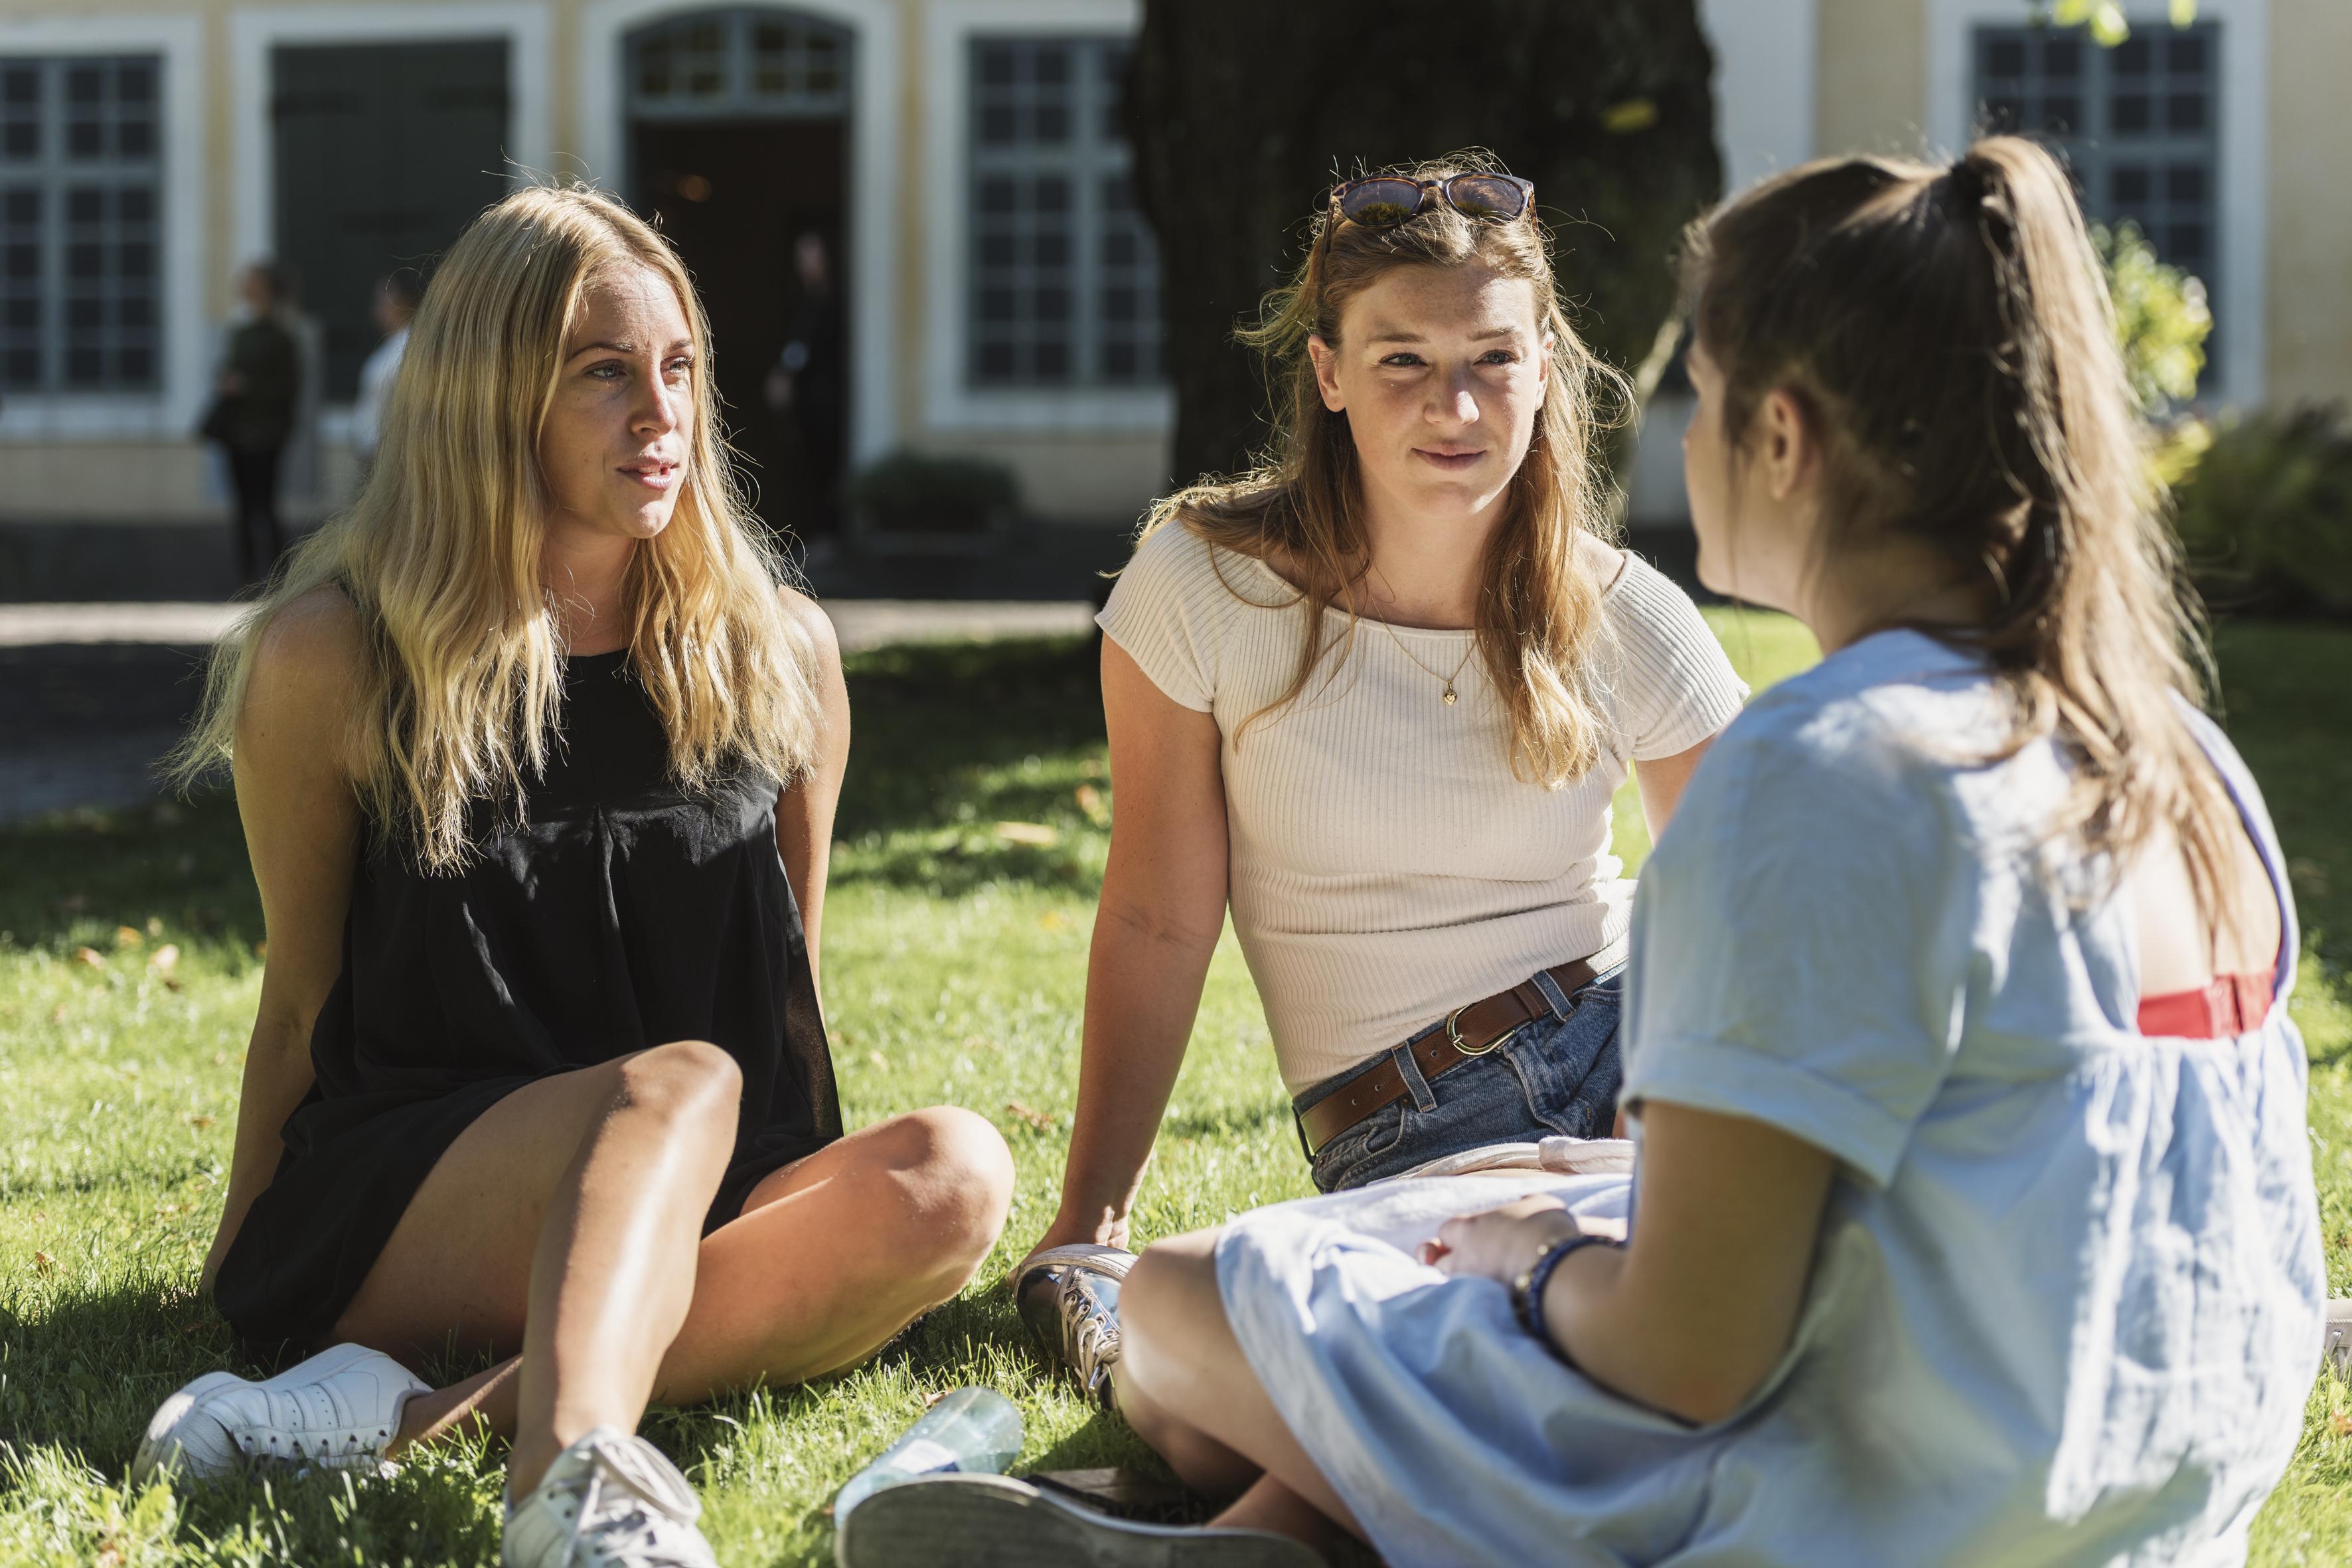 Tre unge kvinner sitter i gresset og prater